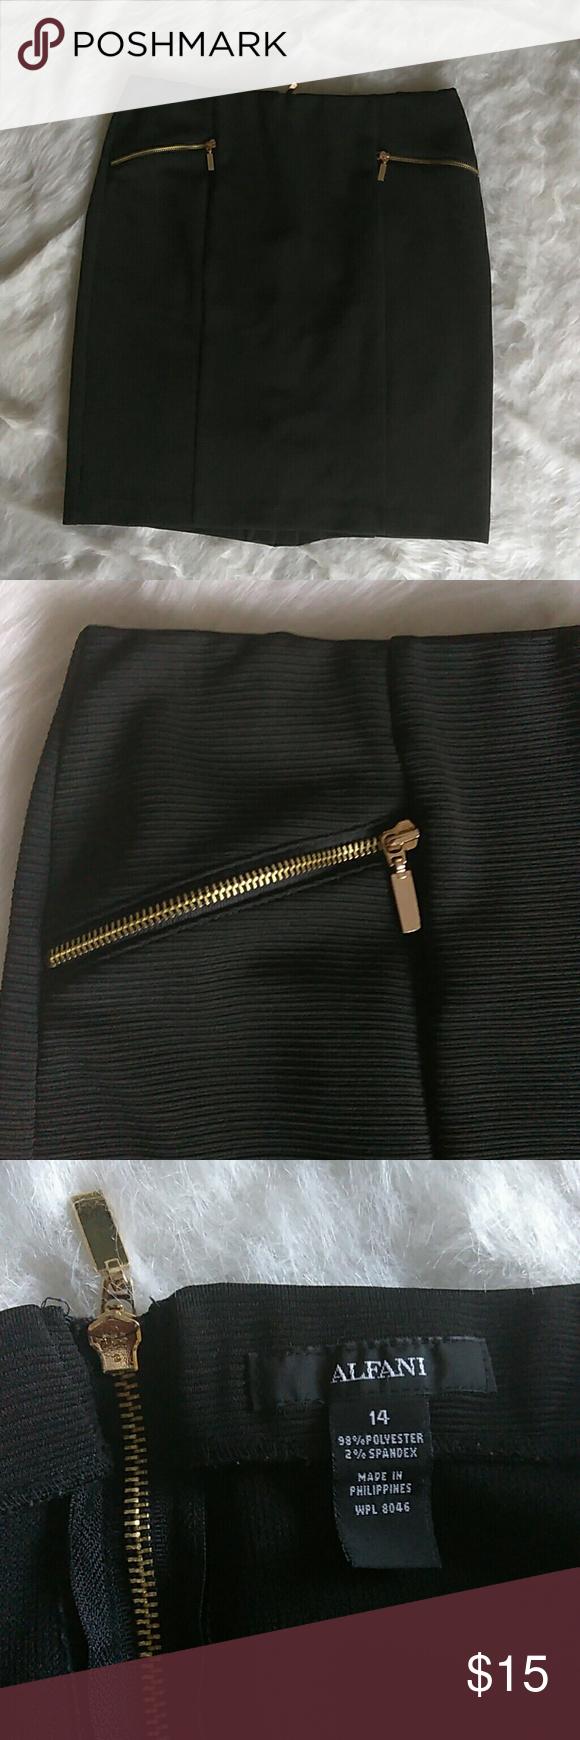 Alfani black women's skirt with gold zipper accent Alfani black Women's Skirt for career or a night out.  Gold zipper accents.  Size 14 or Women's Large.  98% polyester and 2% Spandex. Alfani Skirts Midi